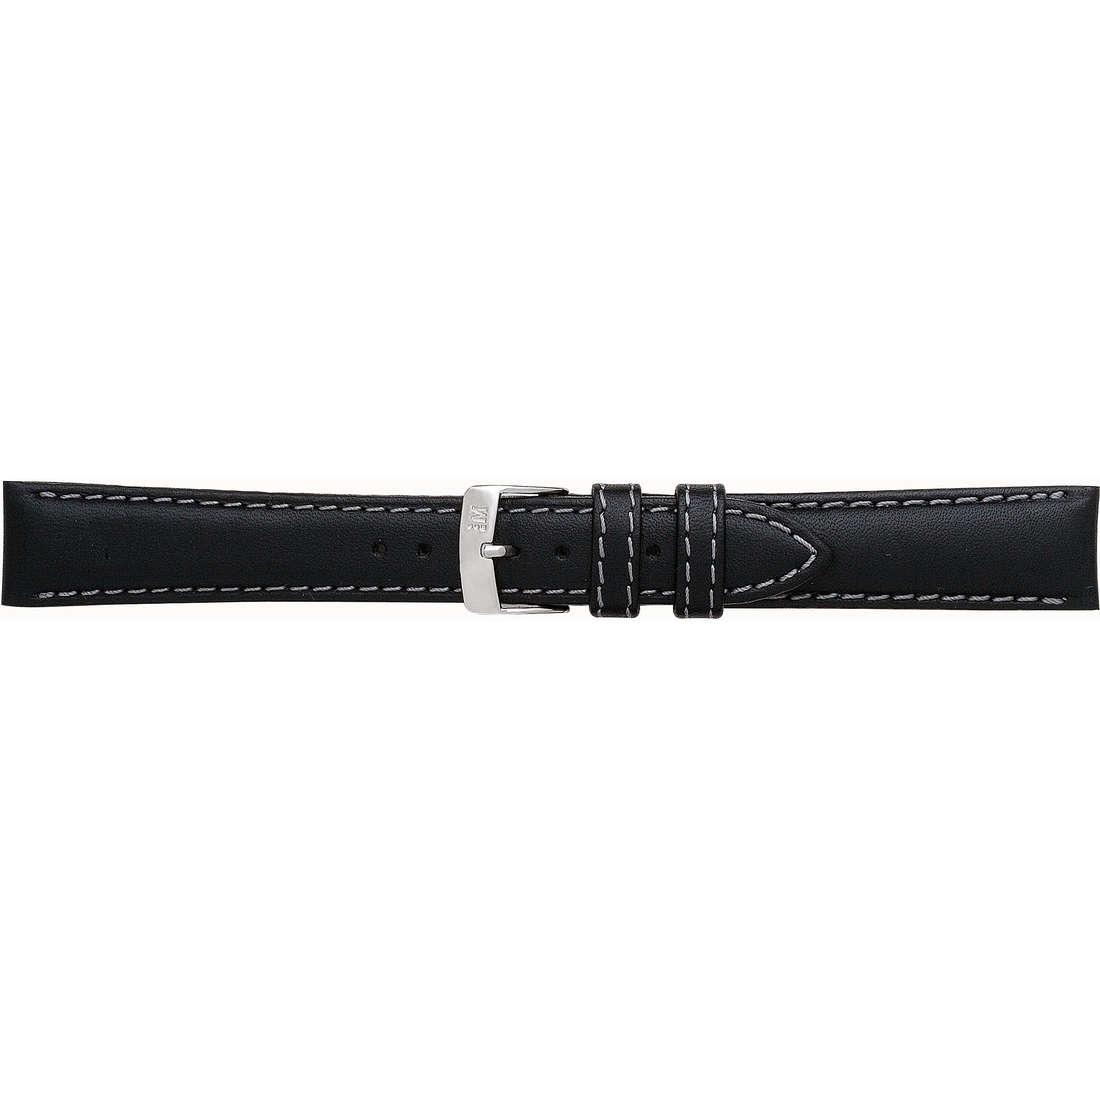 watch watch bands watch straps man Morellato Linea Sport A01X2785237019CR20